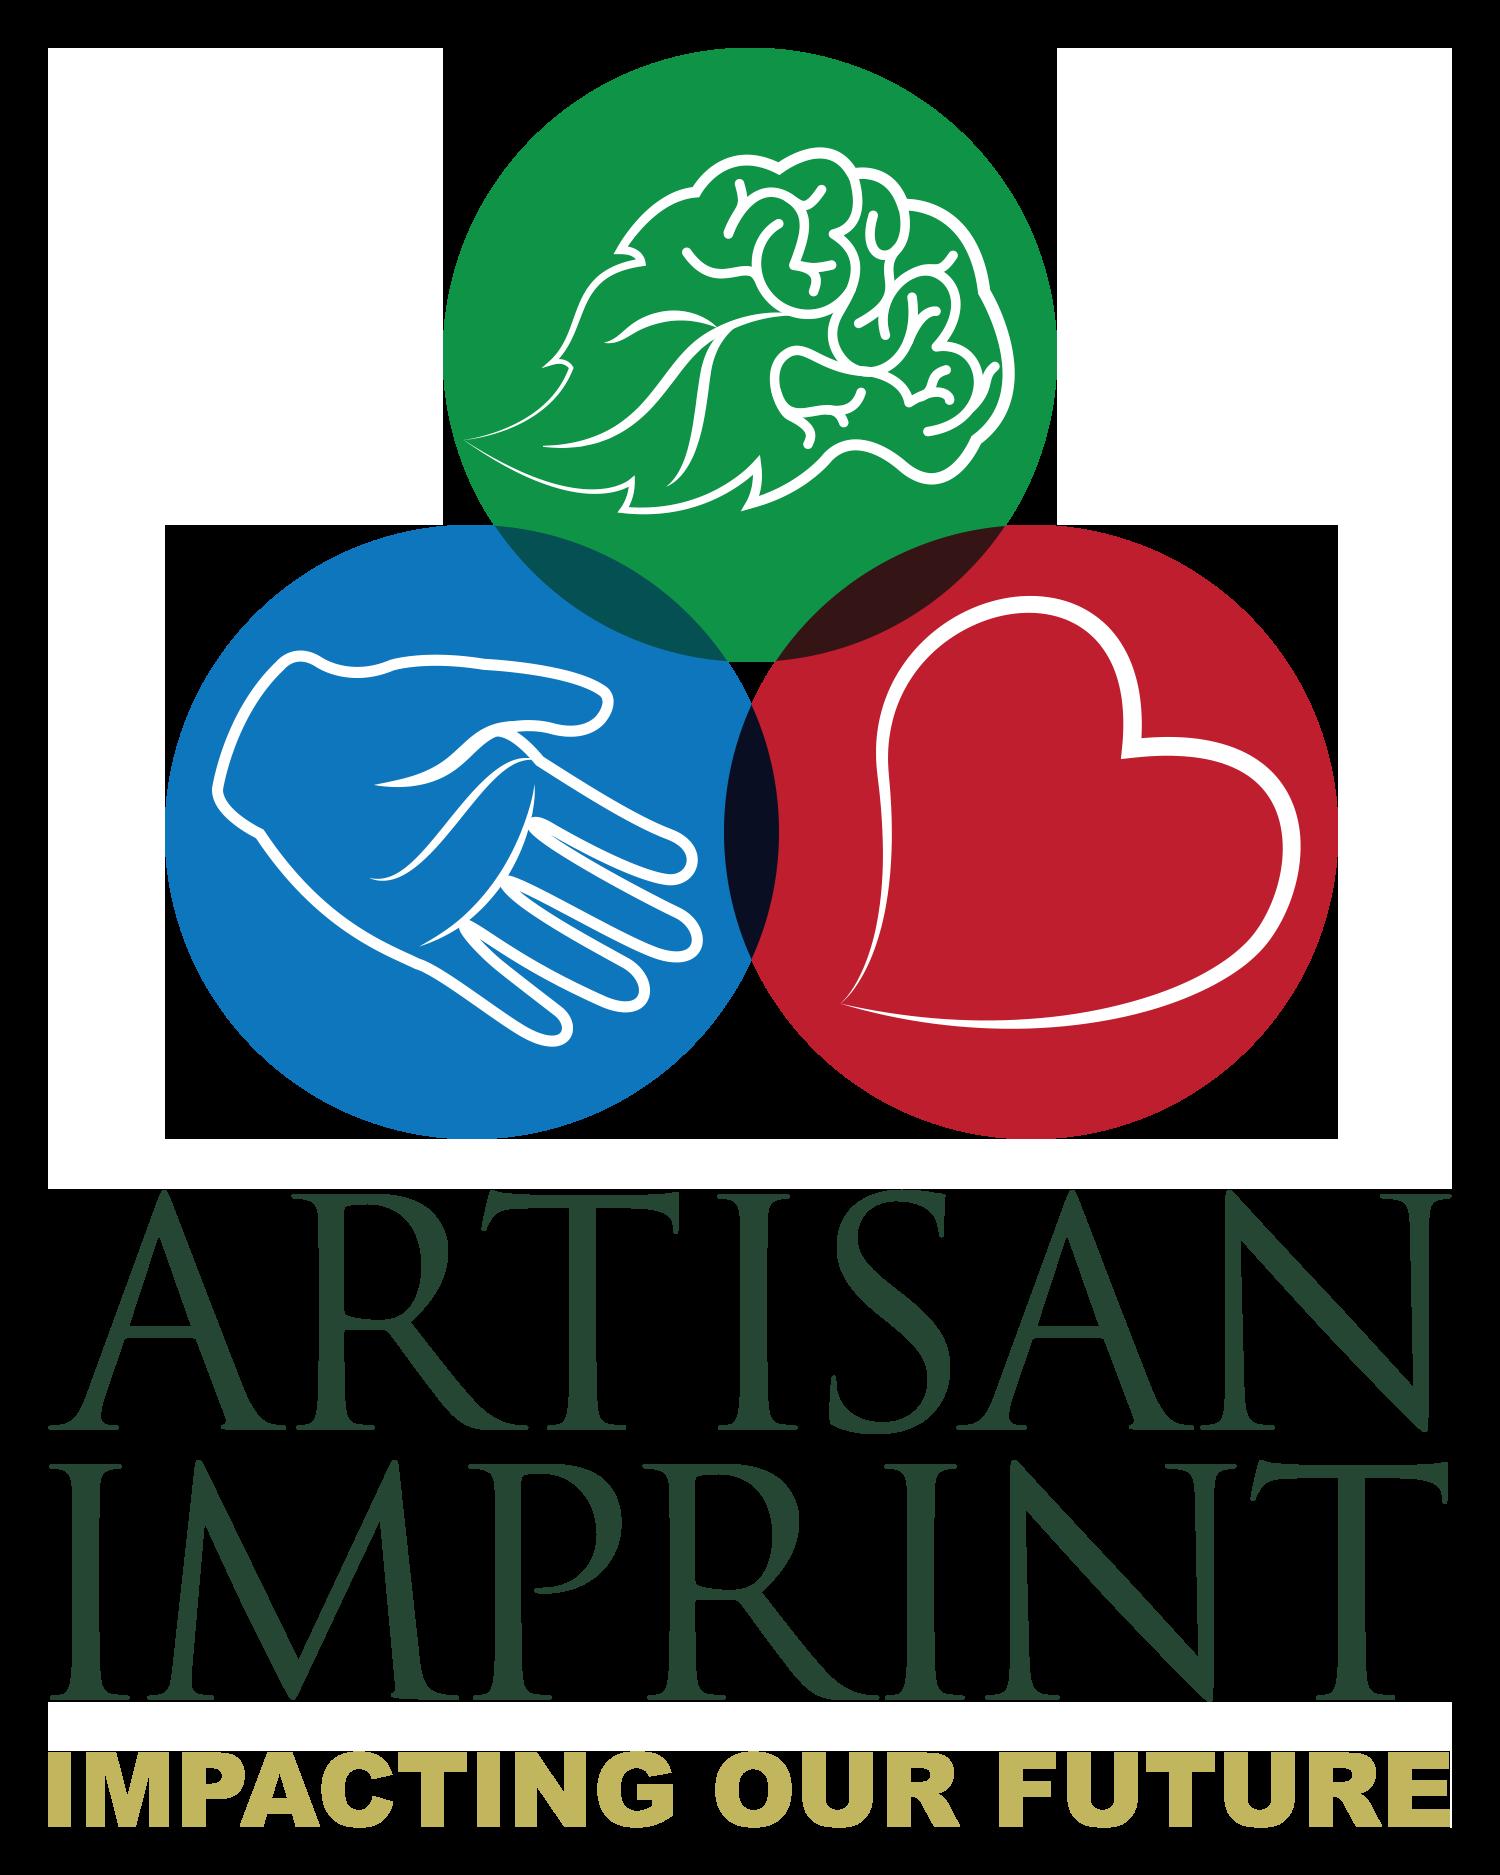 Artisan Imprint Logo